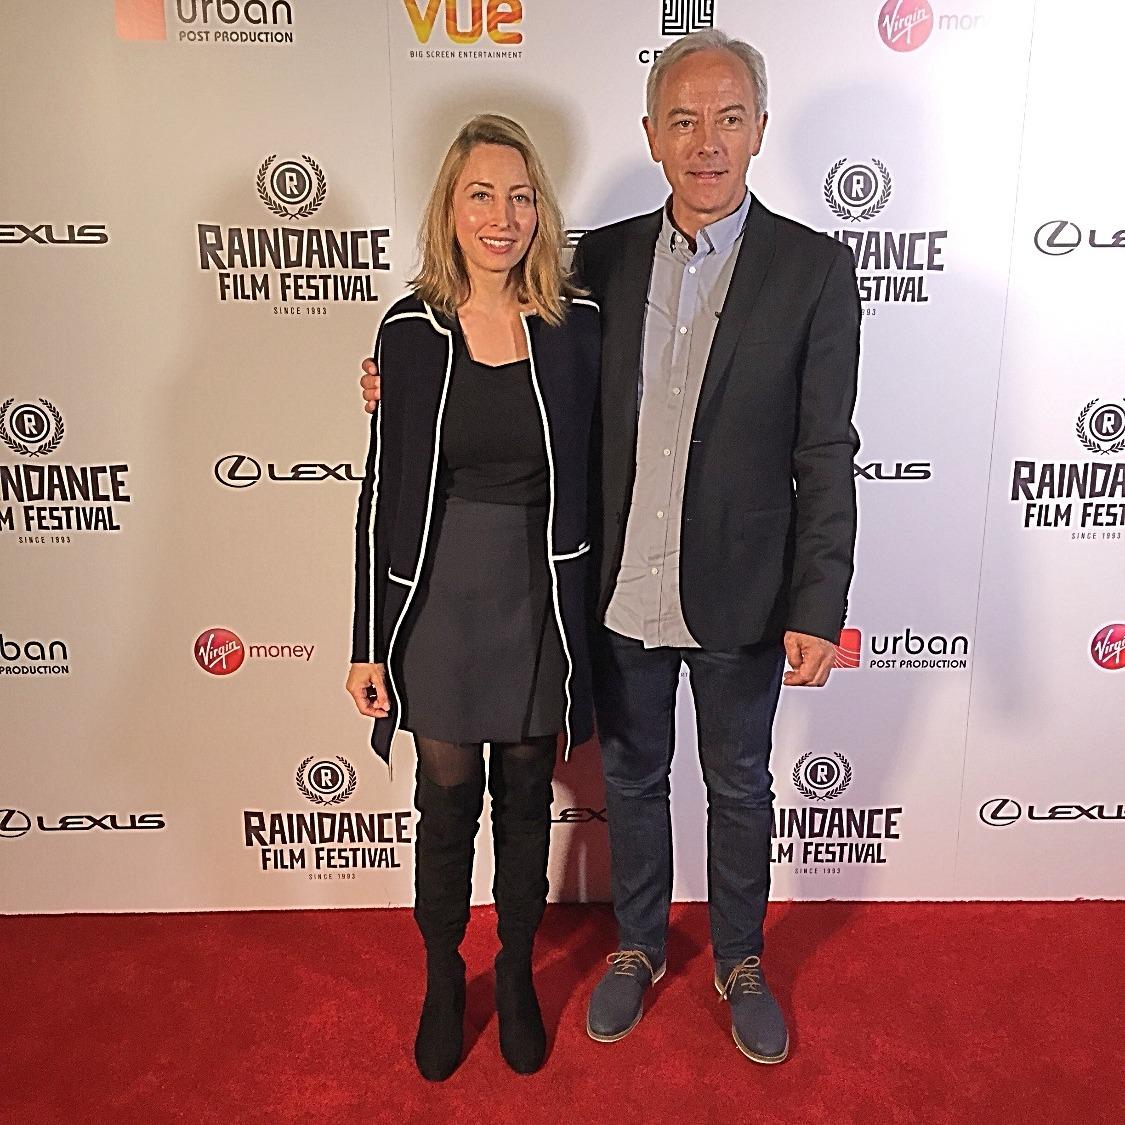 MAG and Douglas Beer-Raindance Film Festival